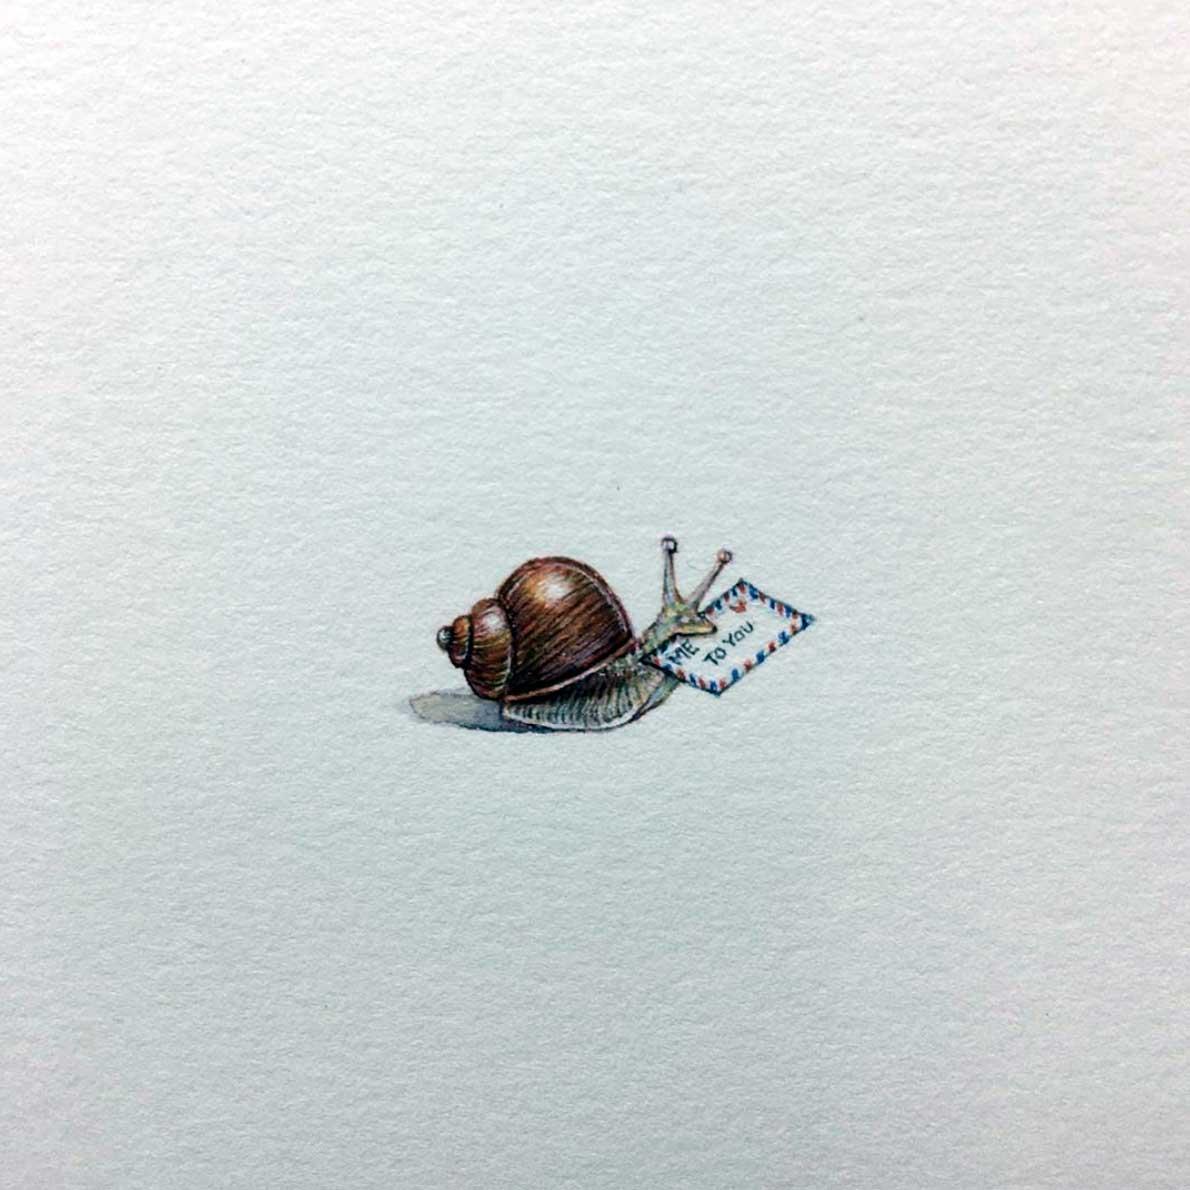 Miniatur-Gemälde von Brooke Rothshank Brooke-Rothshank-miniatur-malerei_10